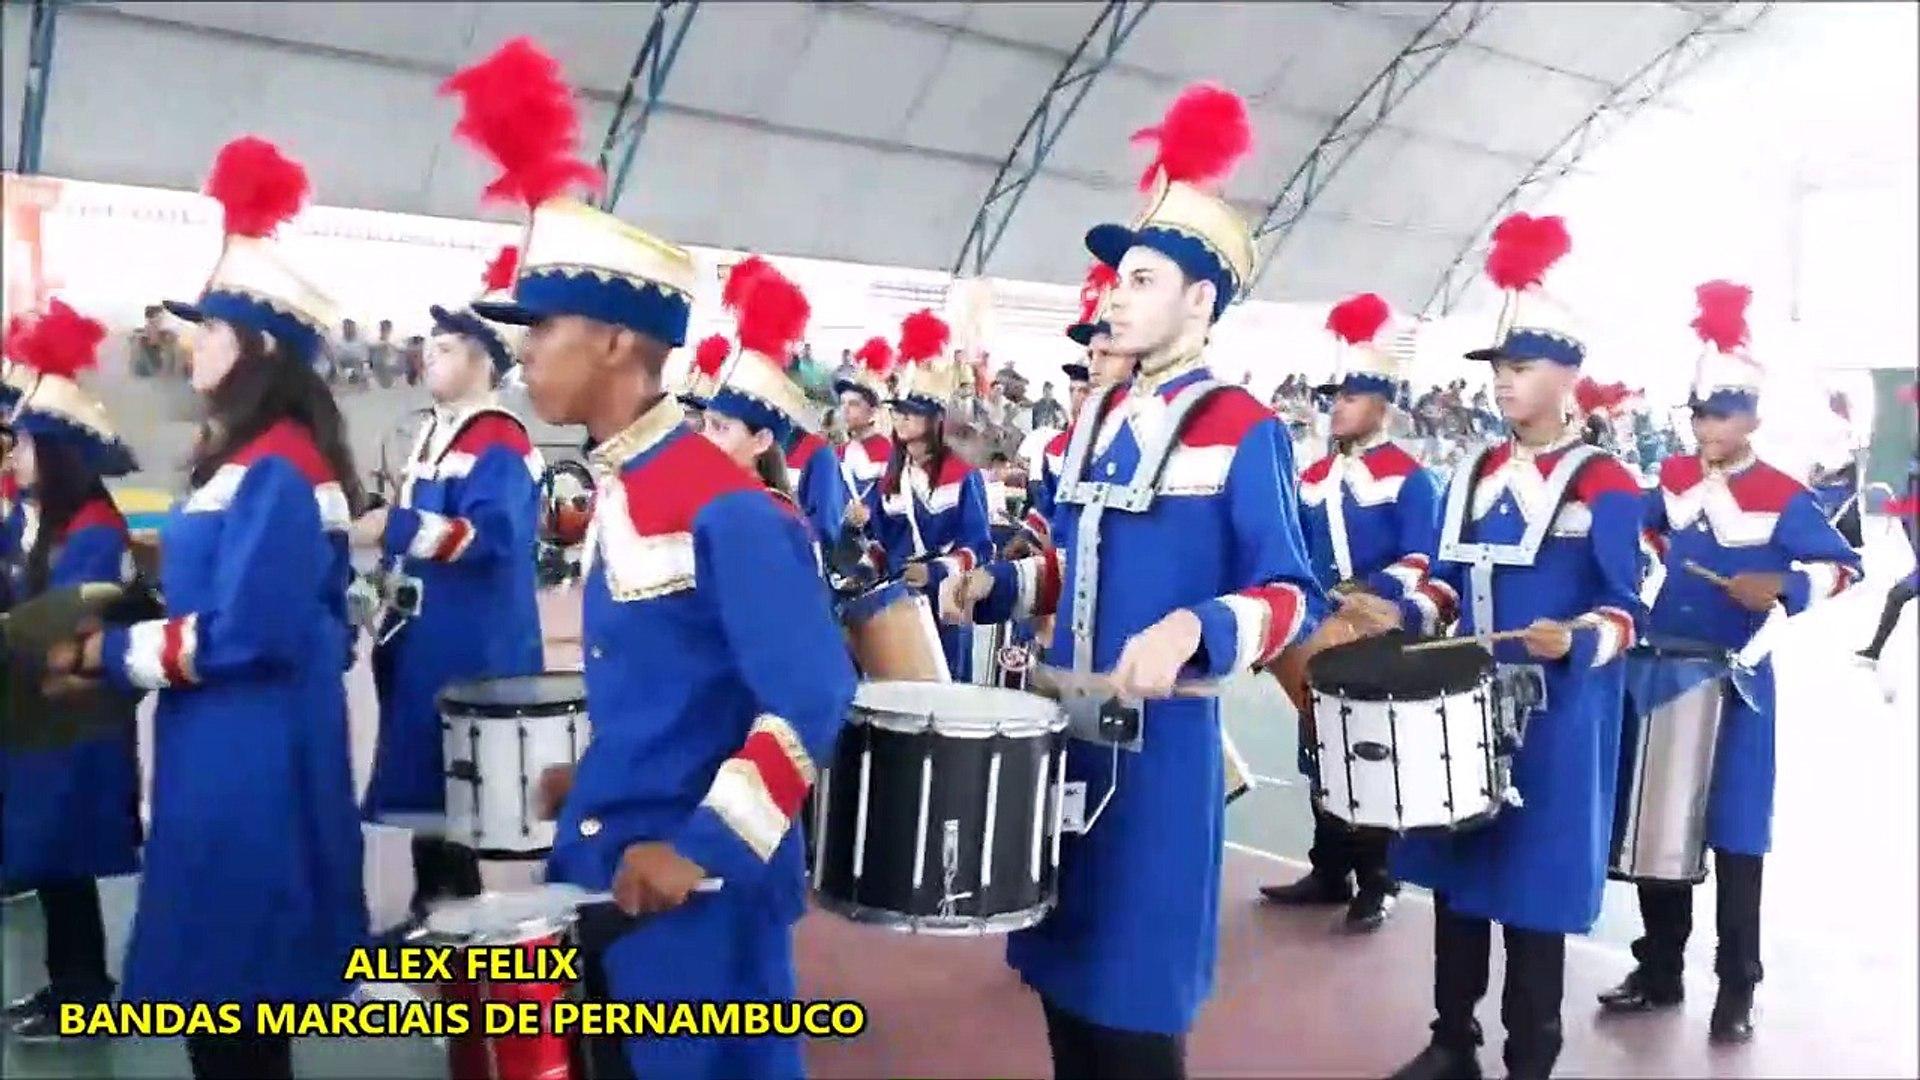 Banda De Percussão Professor Lima Castro 2018 - XI COPA NORDESTE NORTE DE BANDAS E FANFARRAS